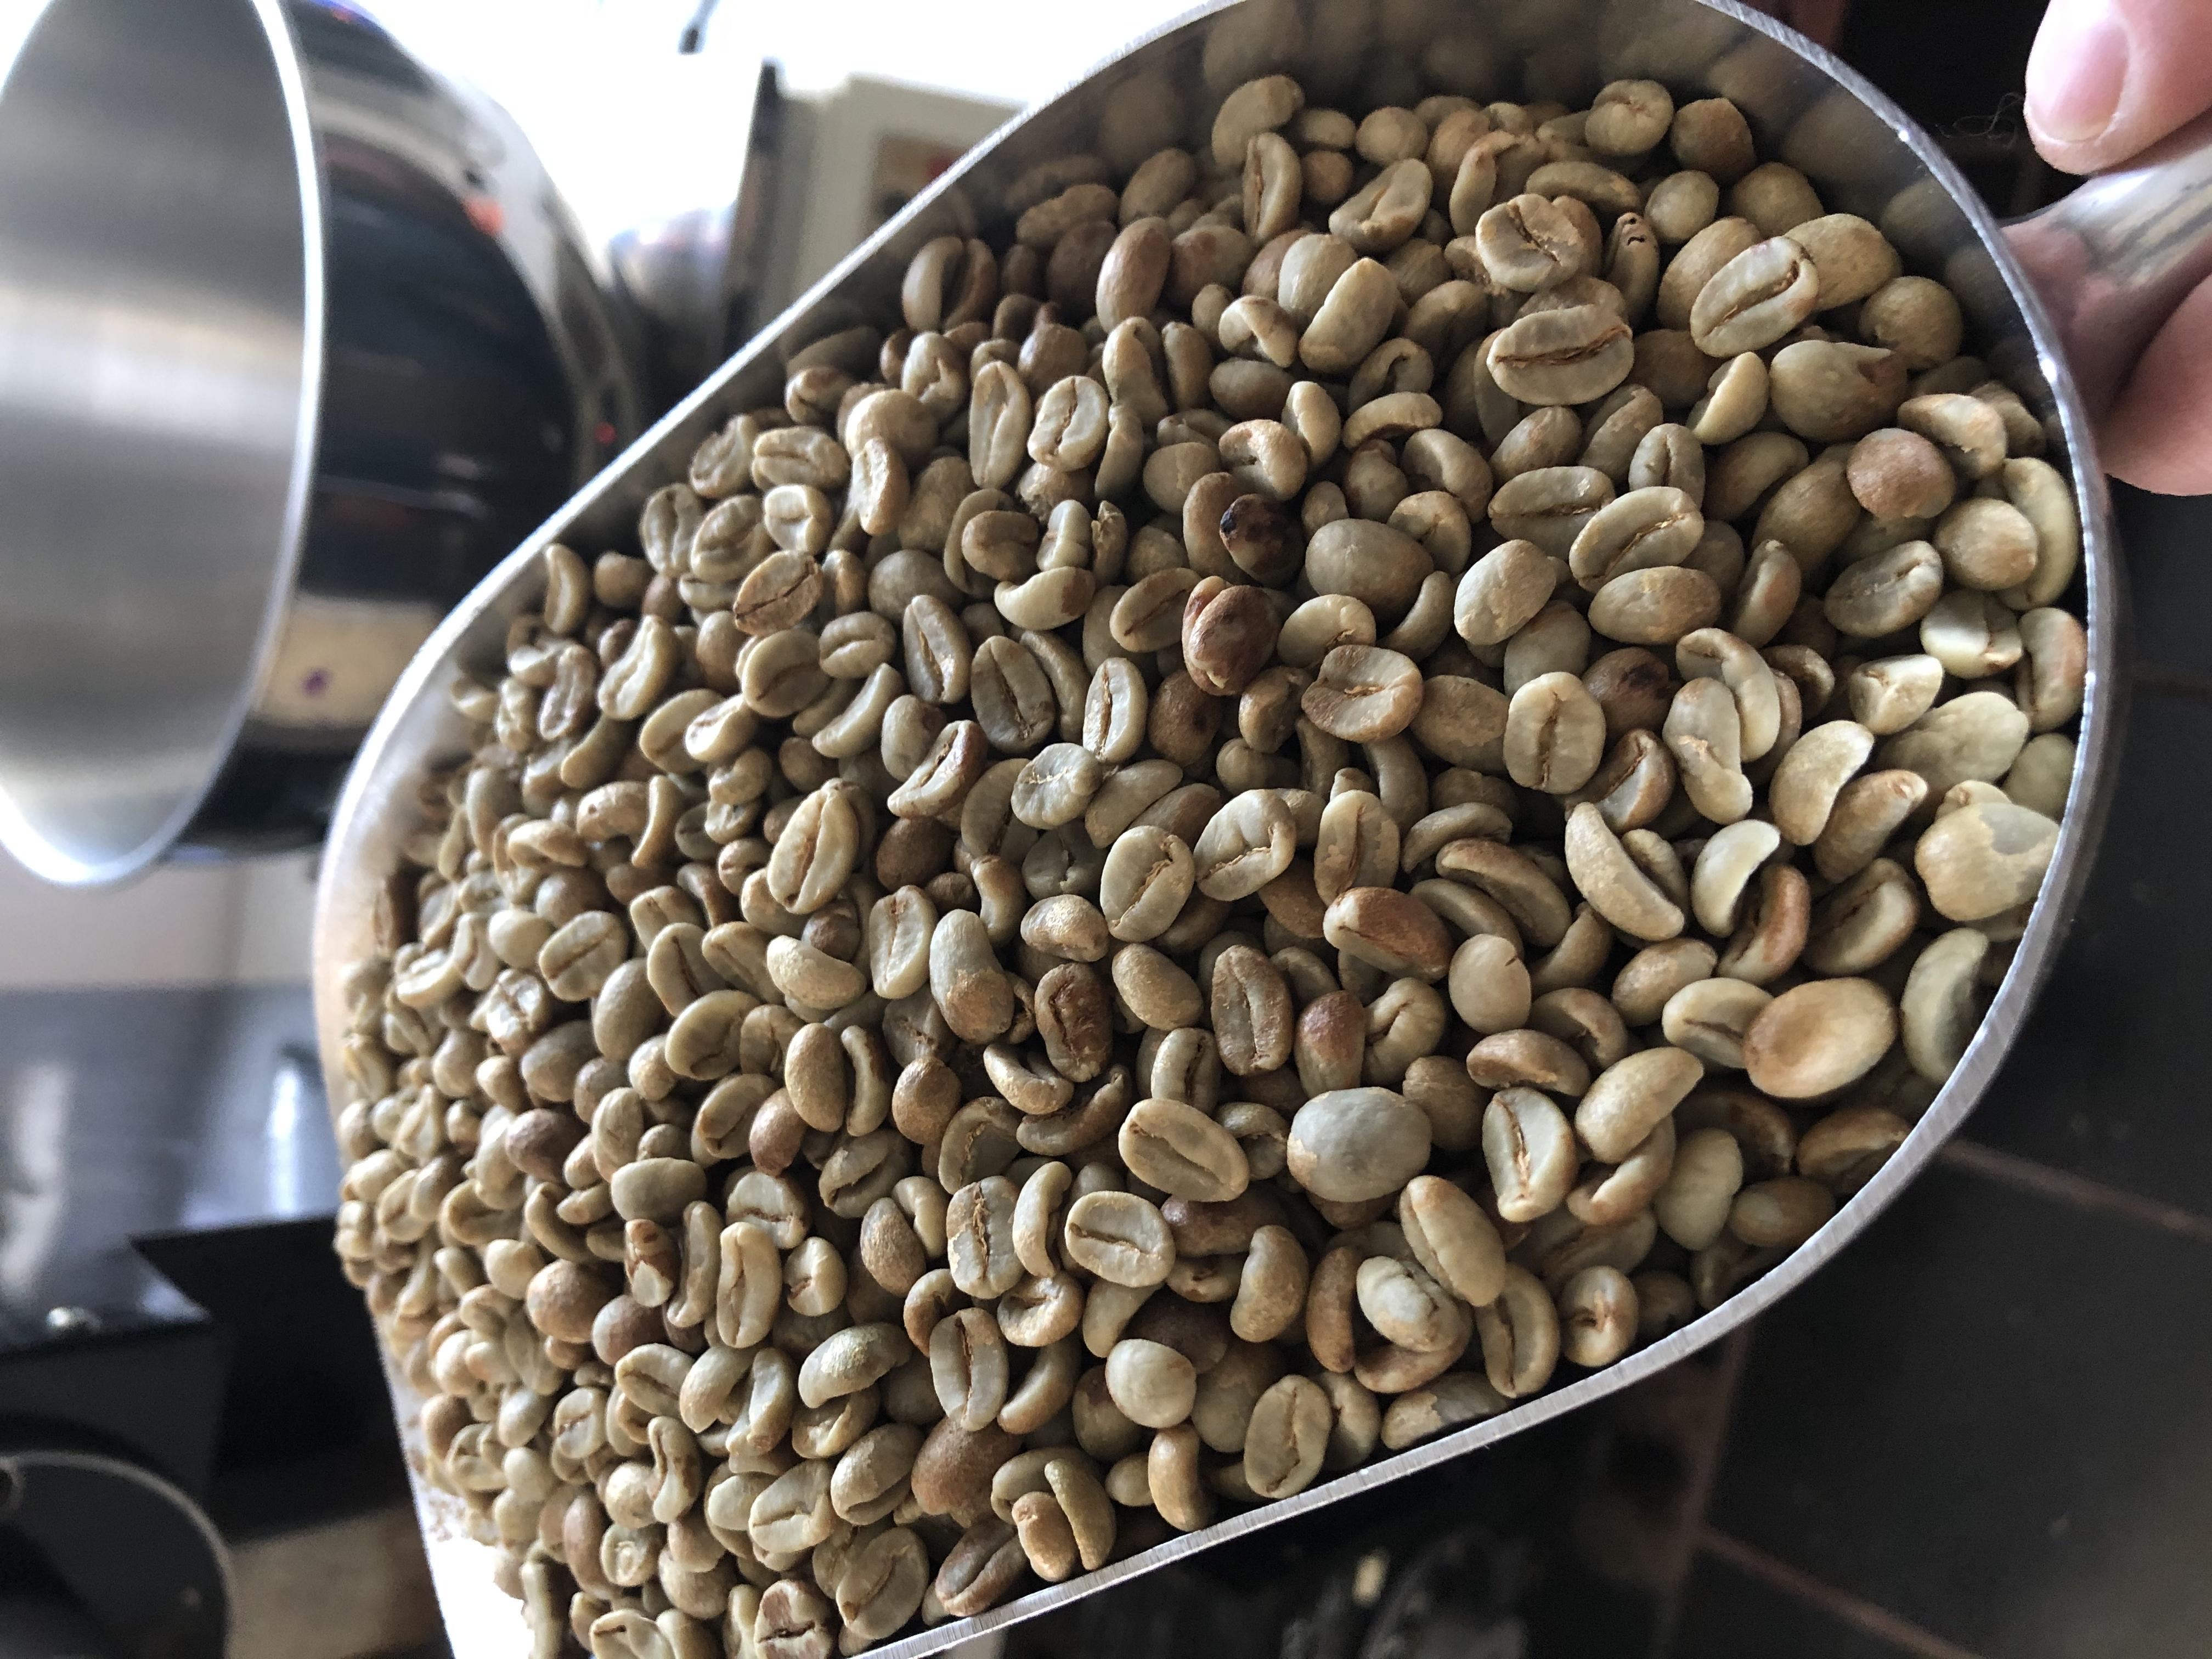 Bag of Guatemala coffee beans